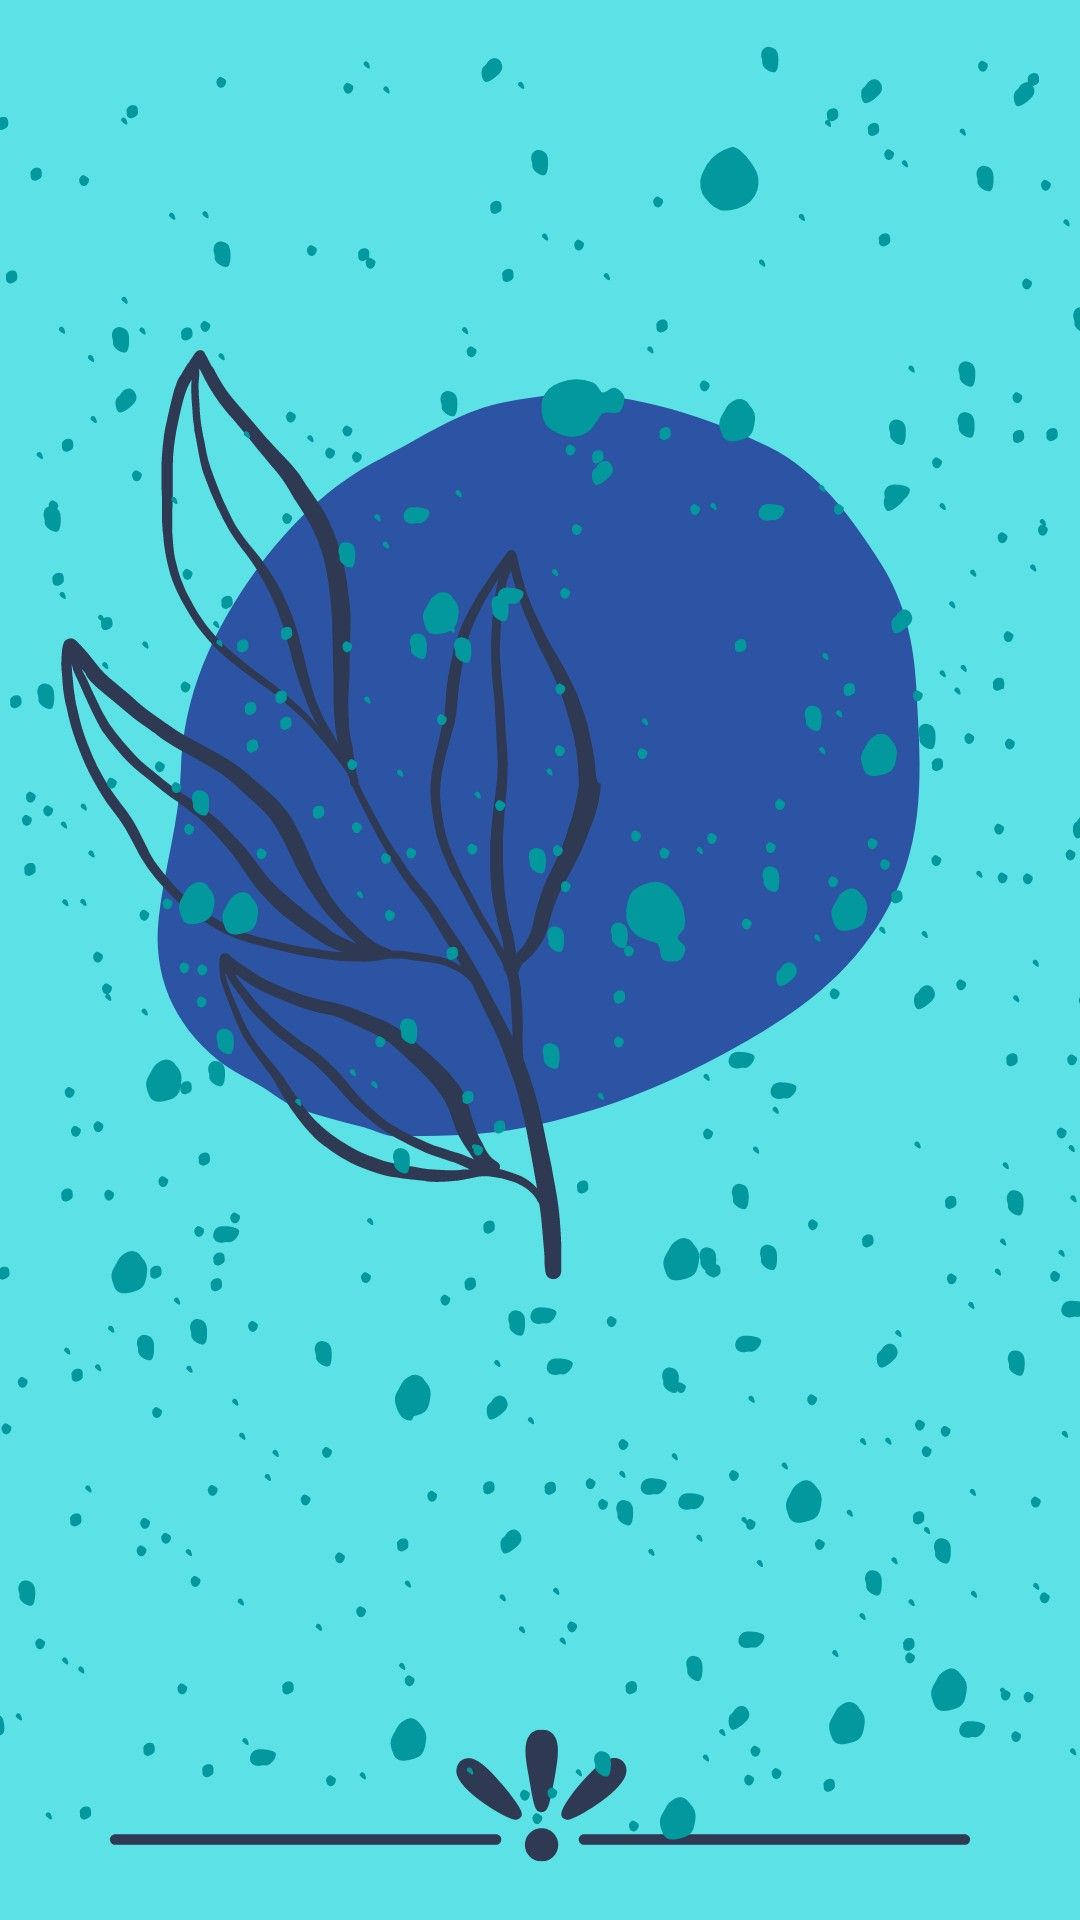 Blue color wallpaper